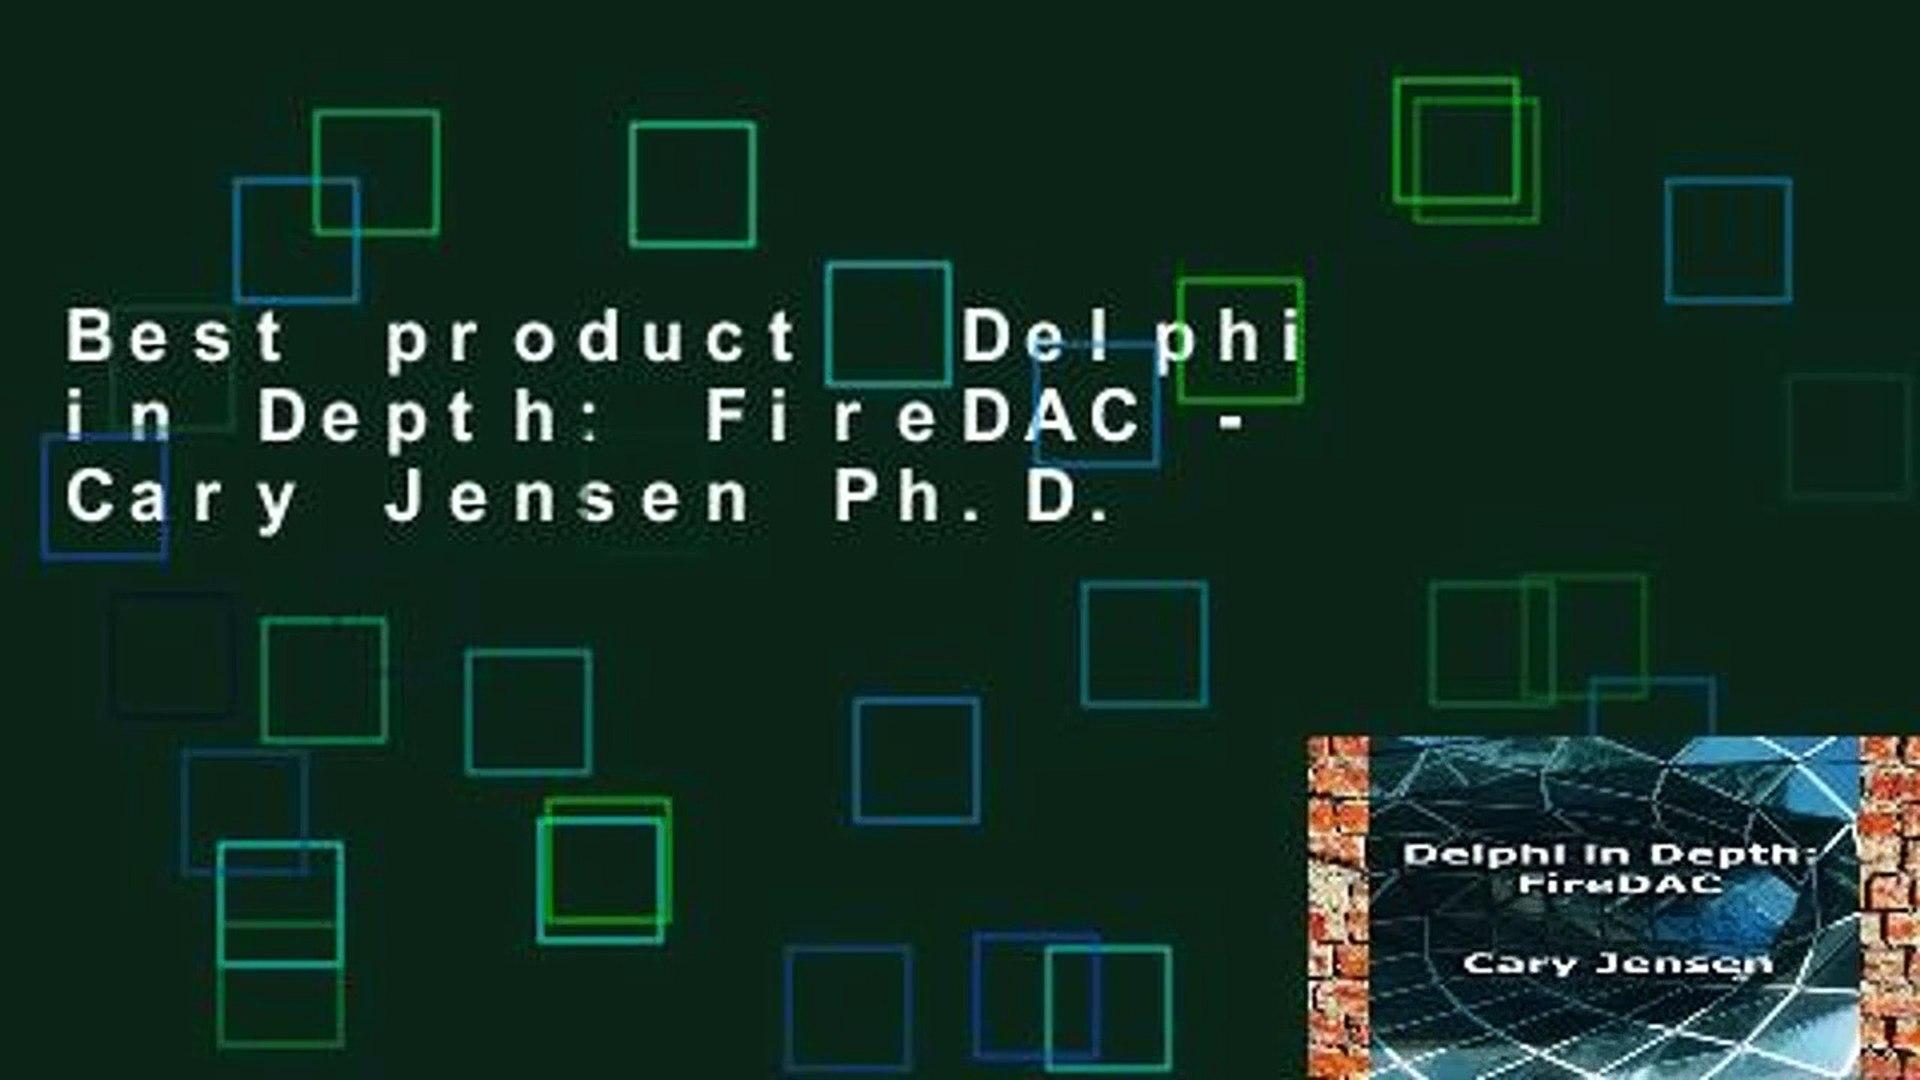 Best product Delphi in Depth: FireDAC - Cary Jensen Ph D